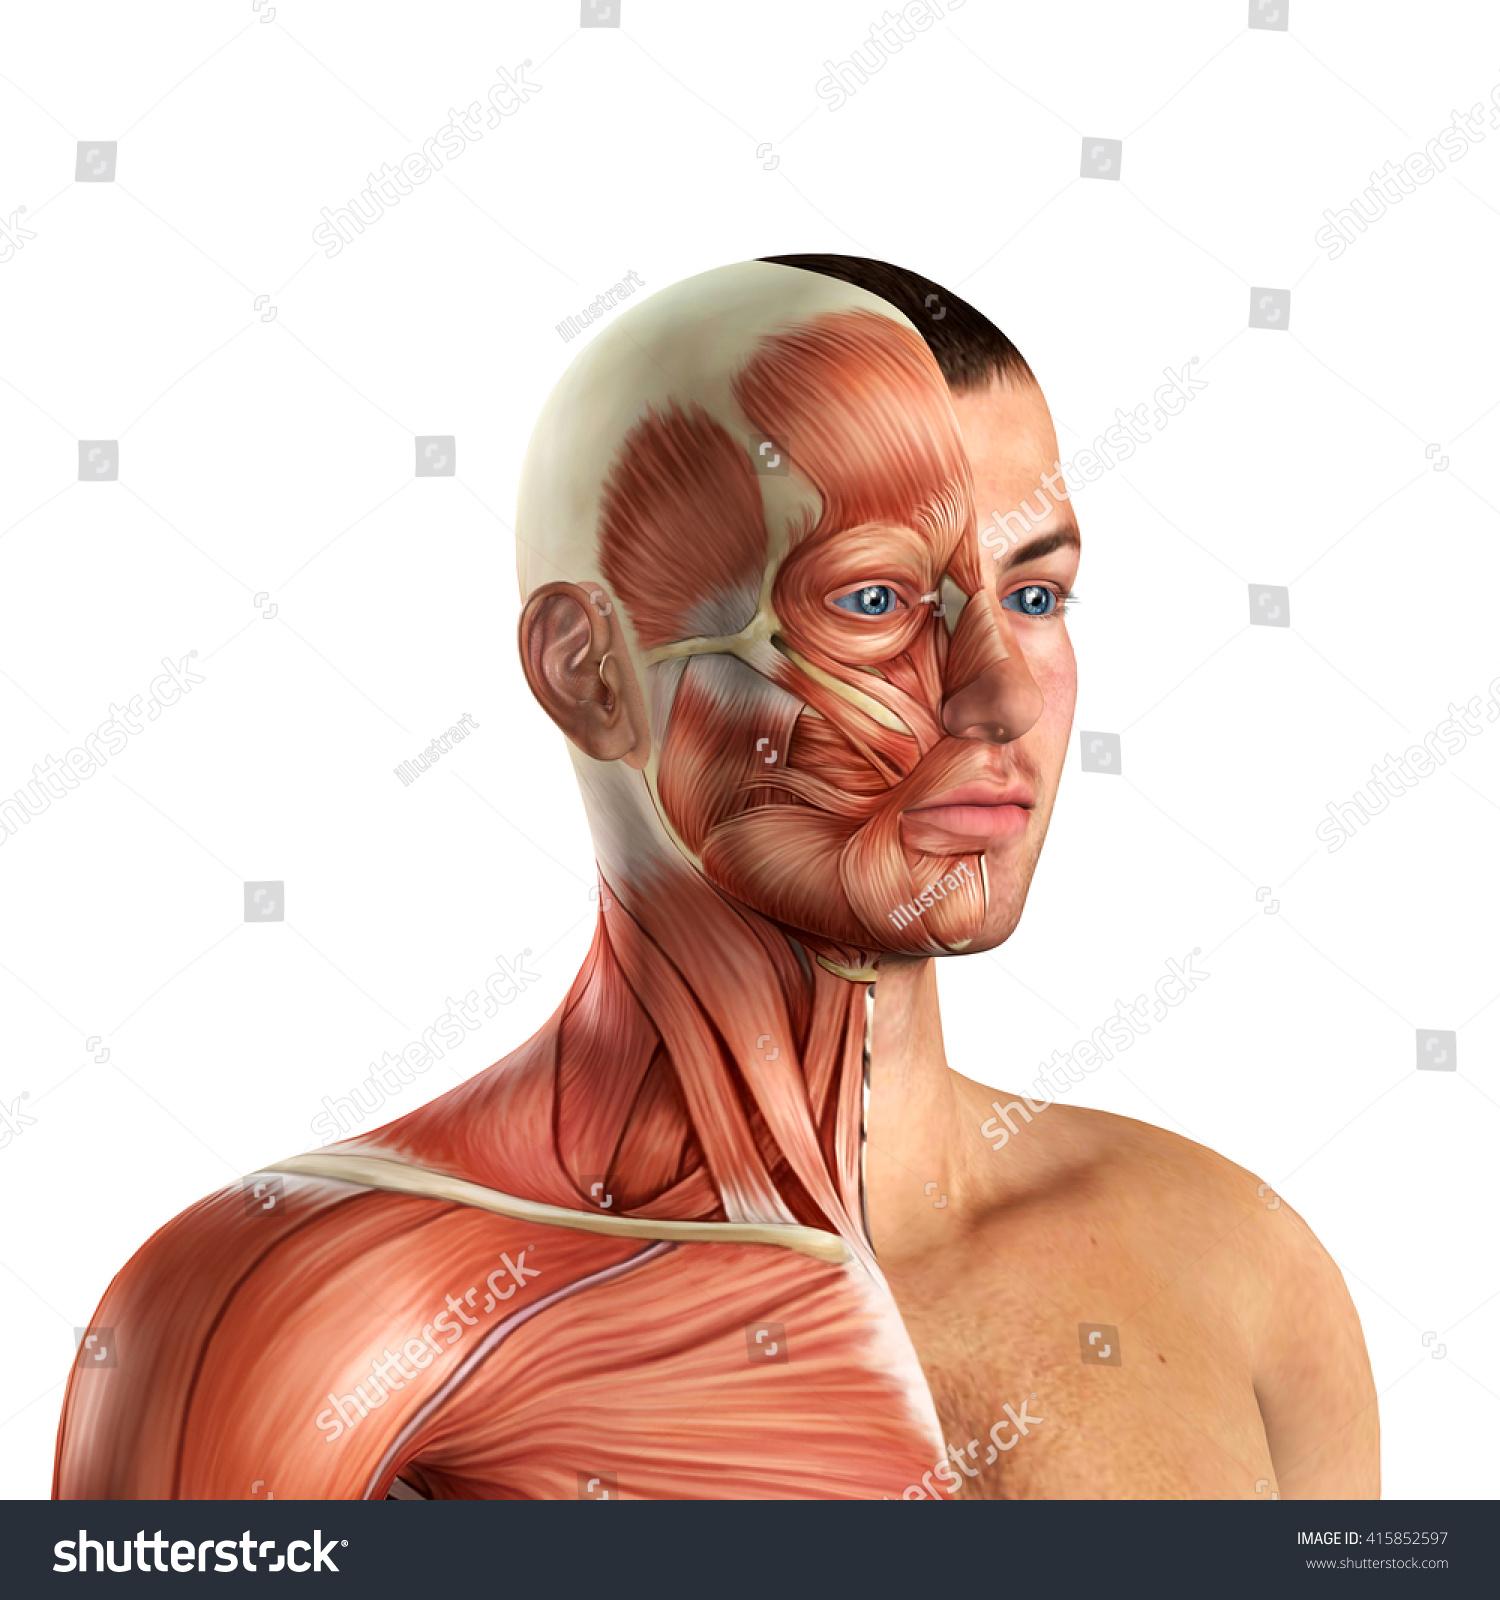 Male Face Muscles Anatomy 3 D Illustration Stock Illustration ...